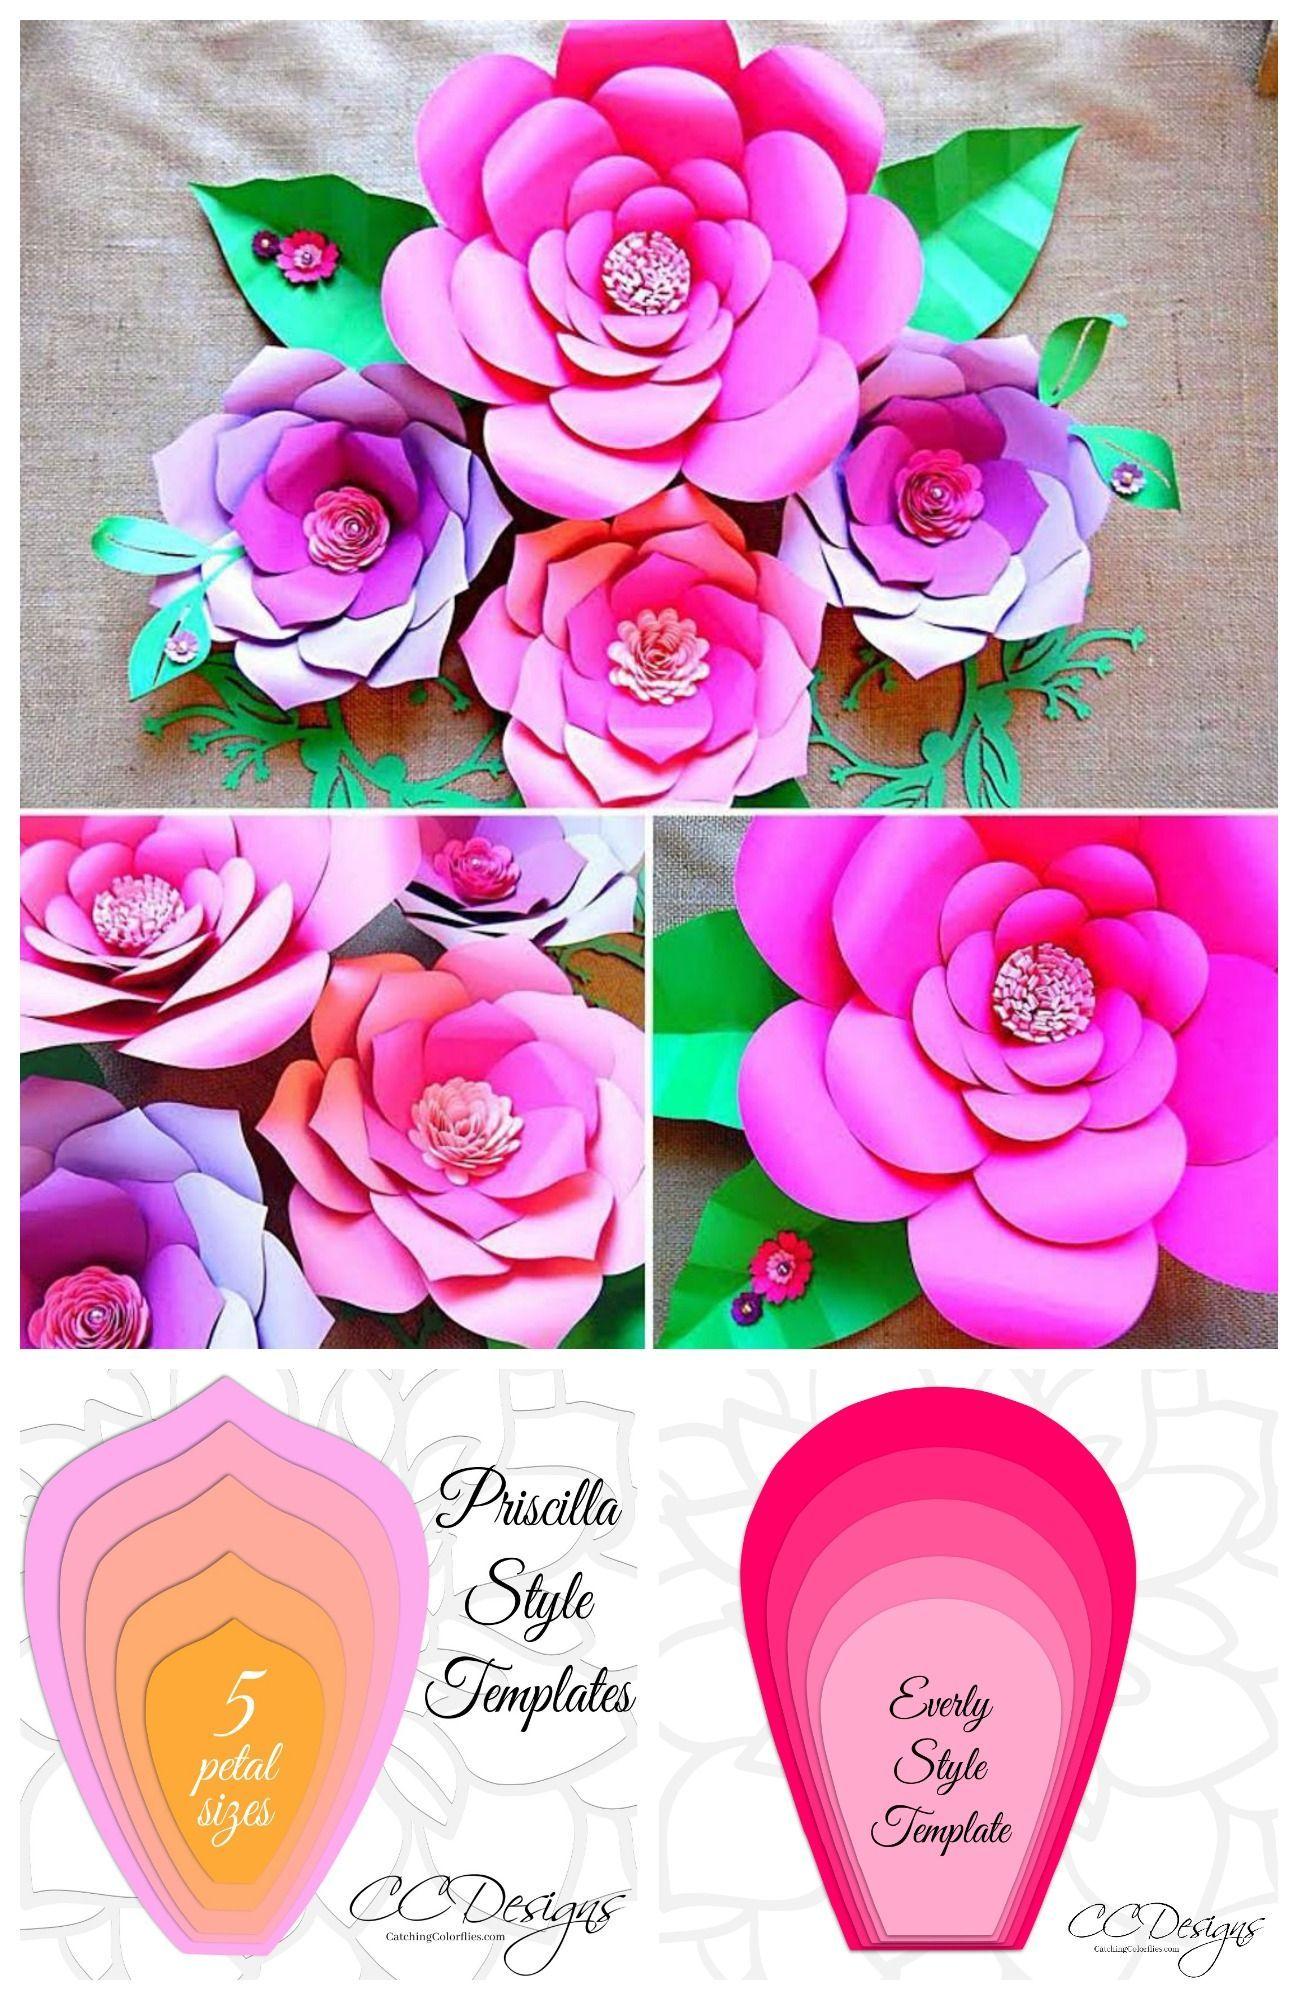 Easy Giant Paper Flower Templates - Printable PDF and SVG Flower Templates#easy #flower #giant #paper #pdf #printable #svg #templates